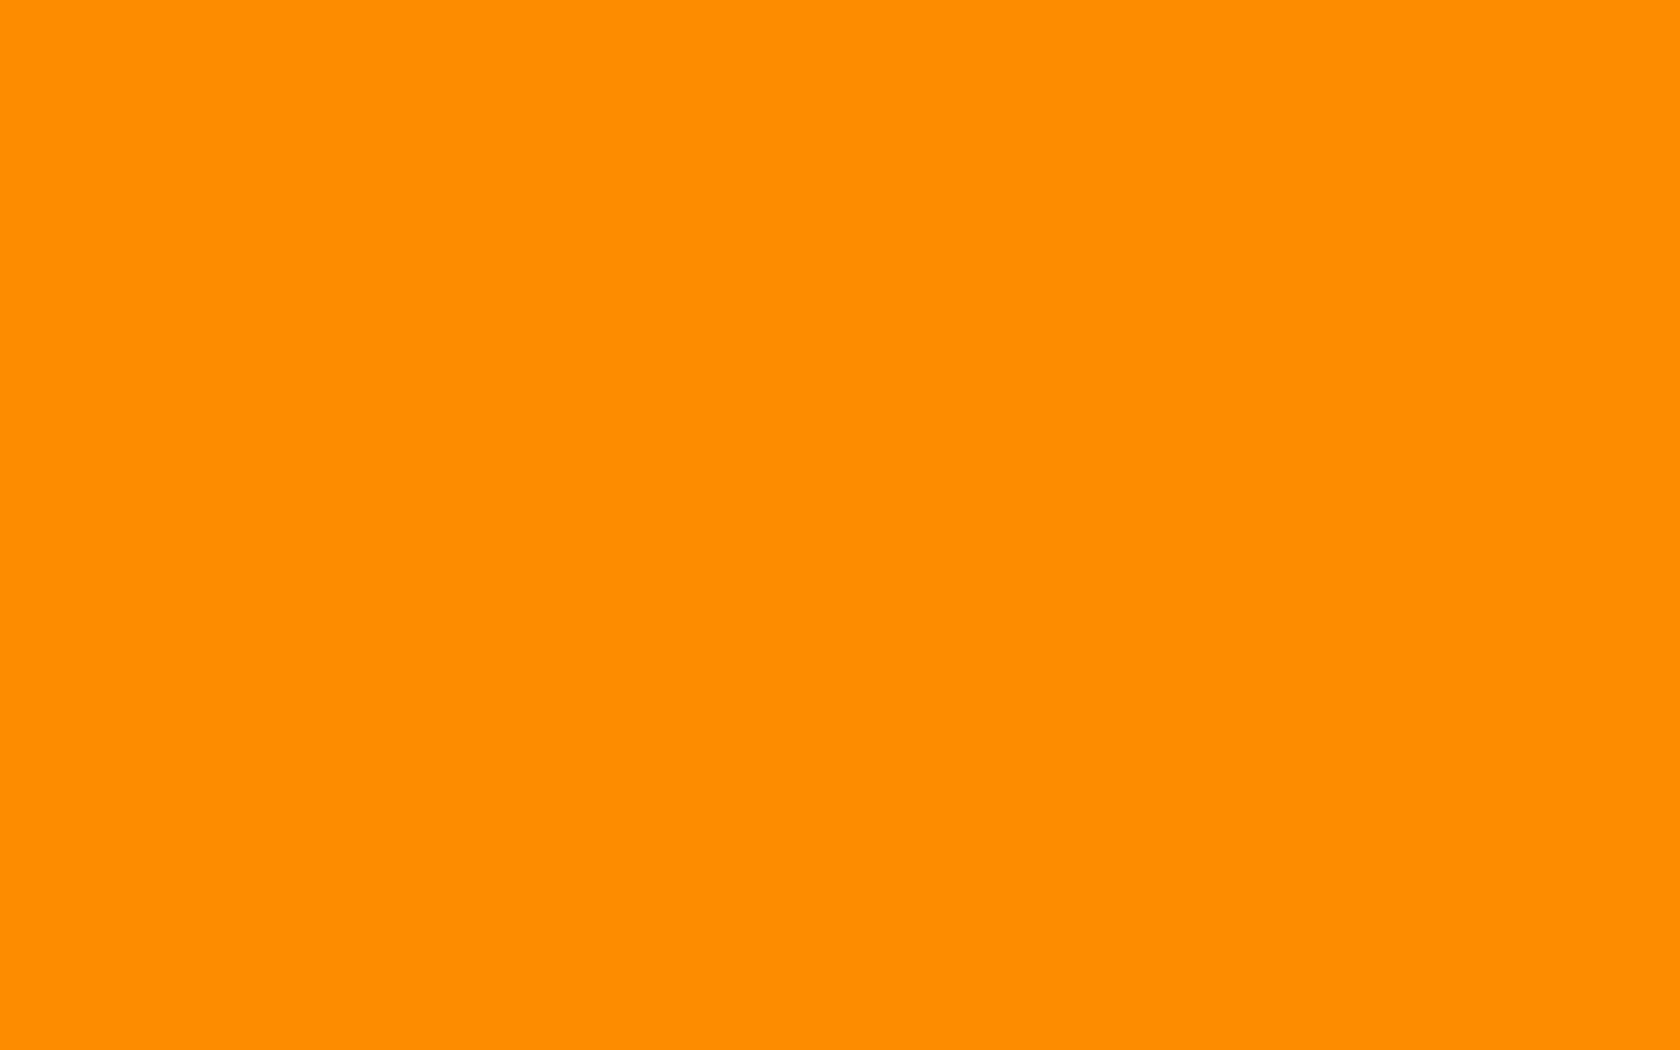 1680x1050 Dark Orange Solid Color Background